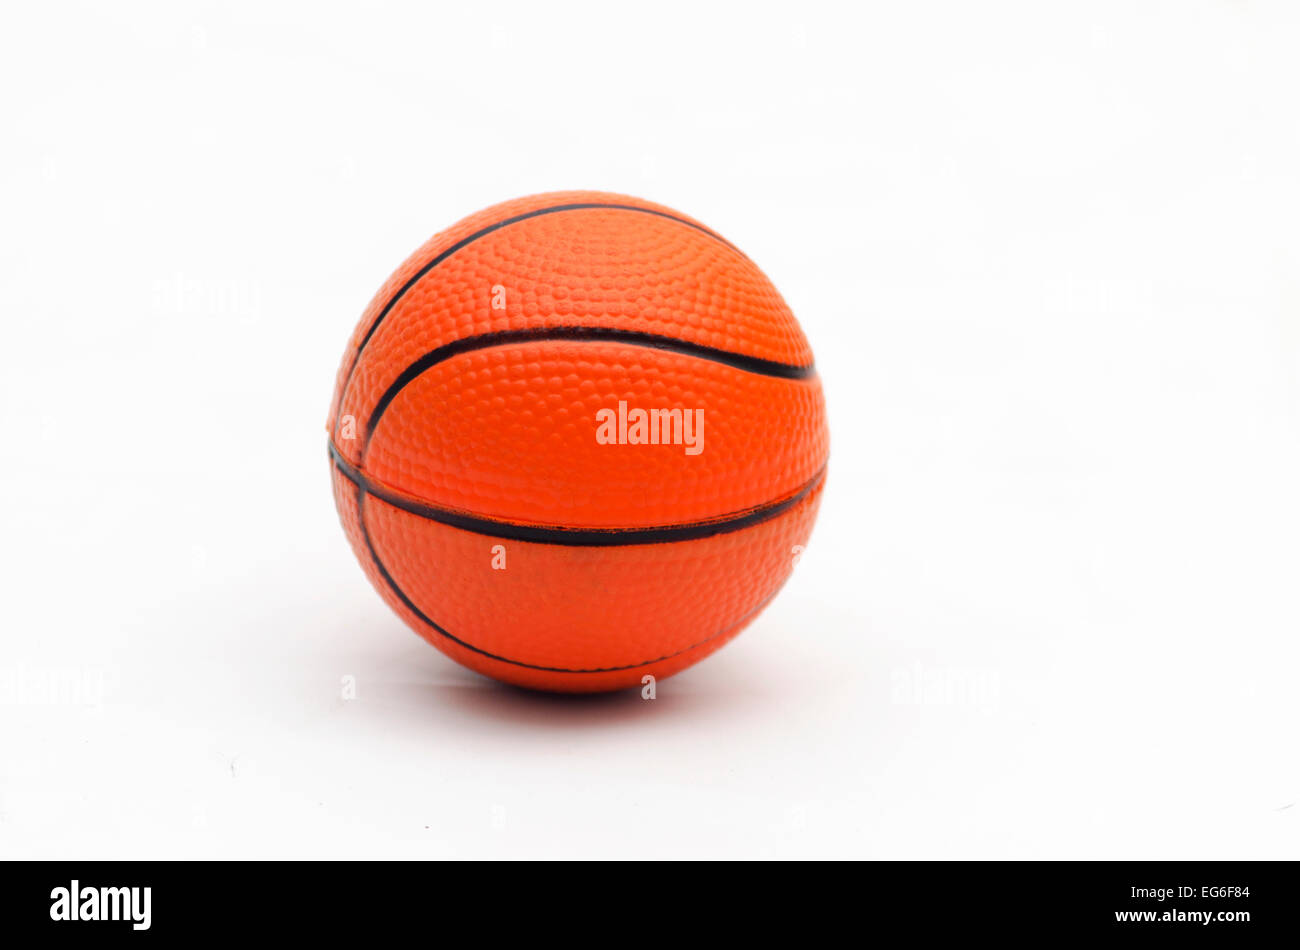 Basket ball naranja sobre fondo blanco. Imagen De Stock